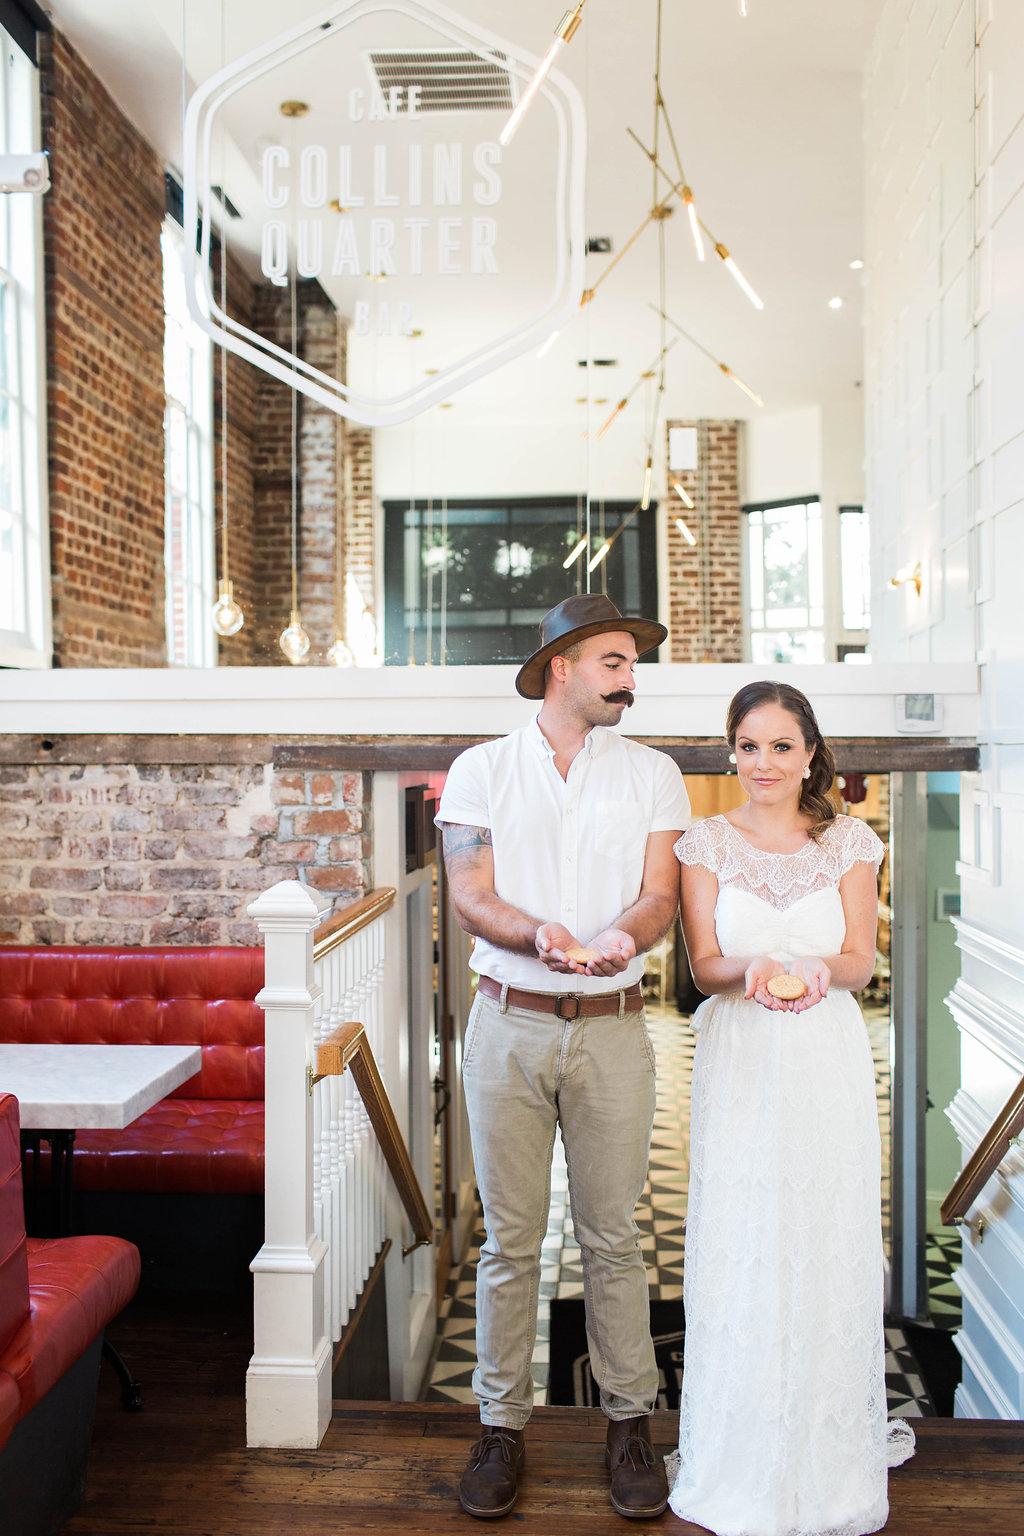 apt-b-photography-ivory-and-beau-bridal-boutique-anna-campbell-isobelle-australian-wedding-the-collins-quarter-savannah-wedding-savannah-weddings-savannah-florist-savannah-bridal-savannah-event-designer-savannah-wedding-dresses-outback-wedding-2.jpg